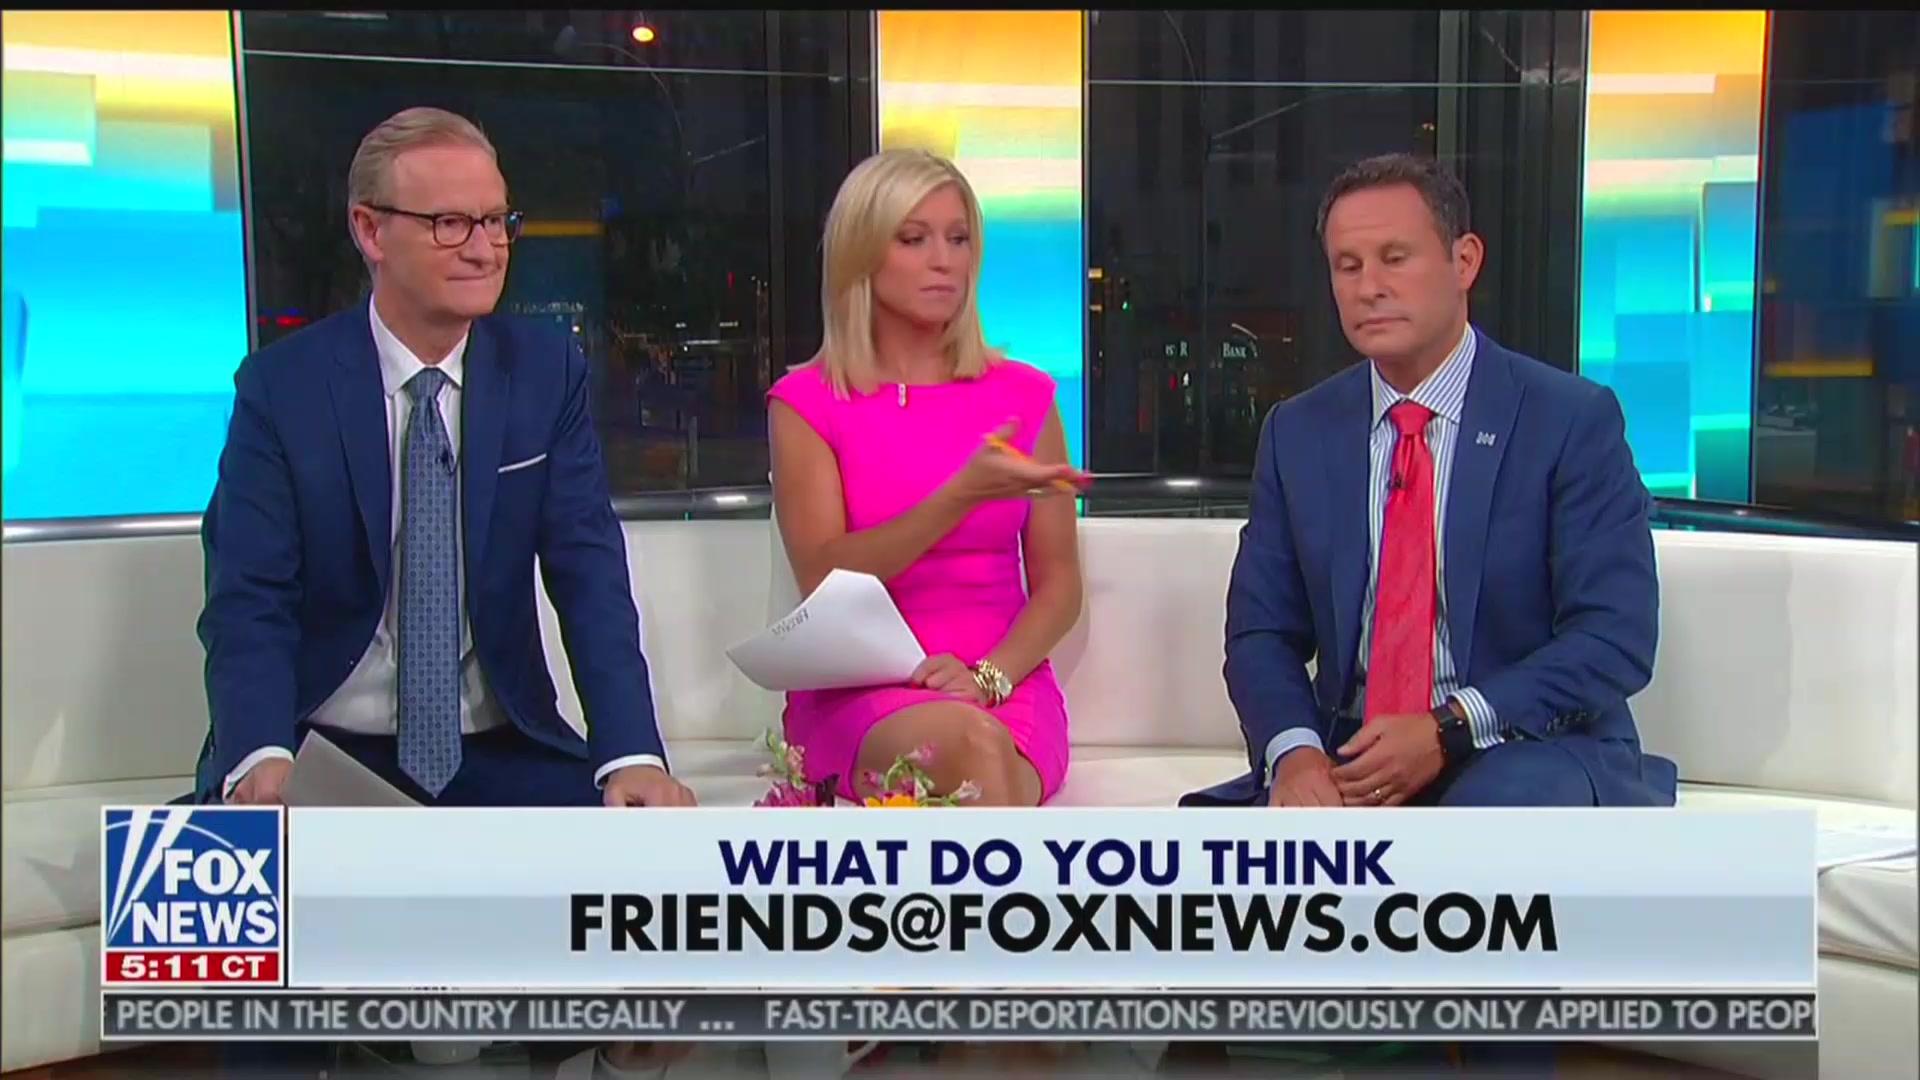 Fox News Host Ainsley Earhardt Thinks McDonald's Employees Make Tips